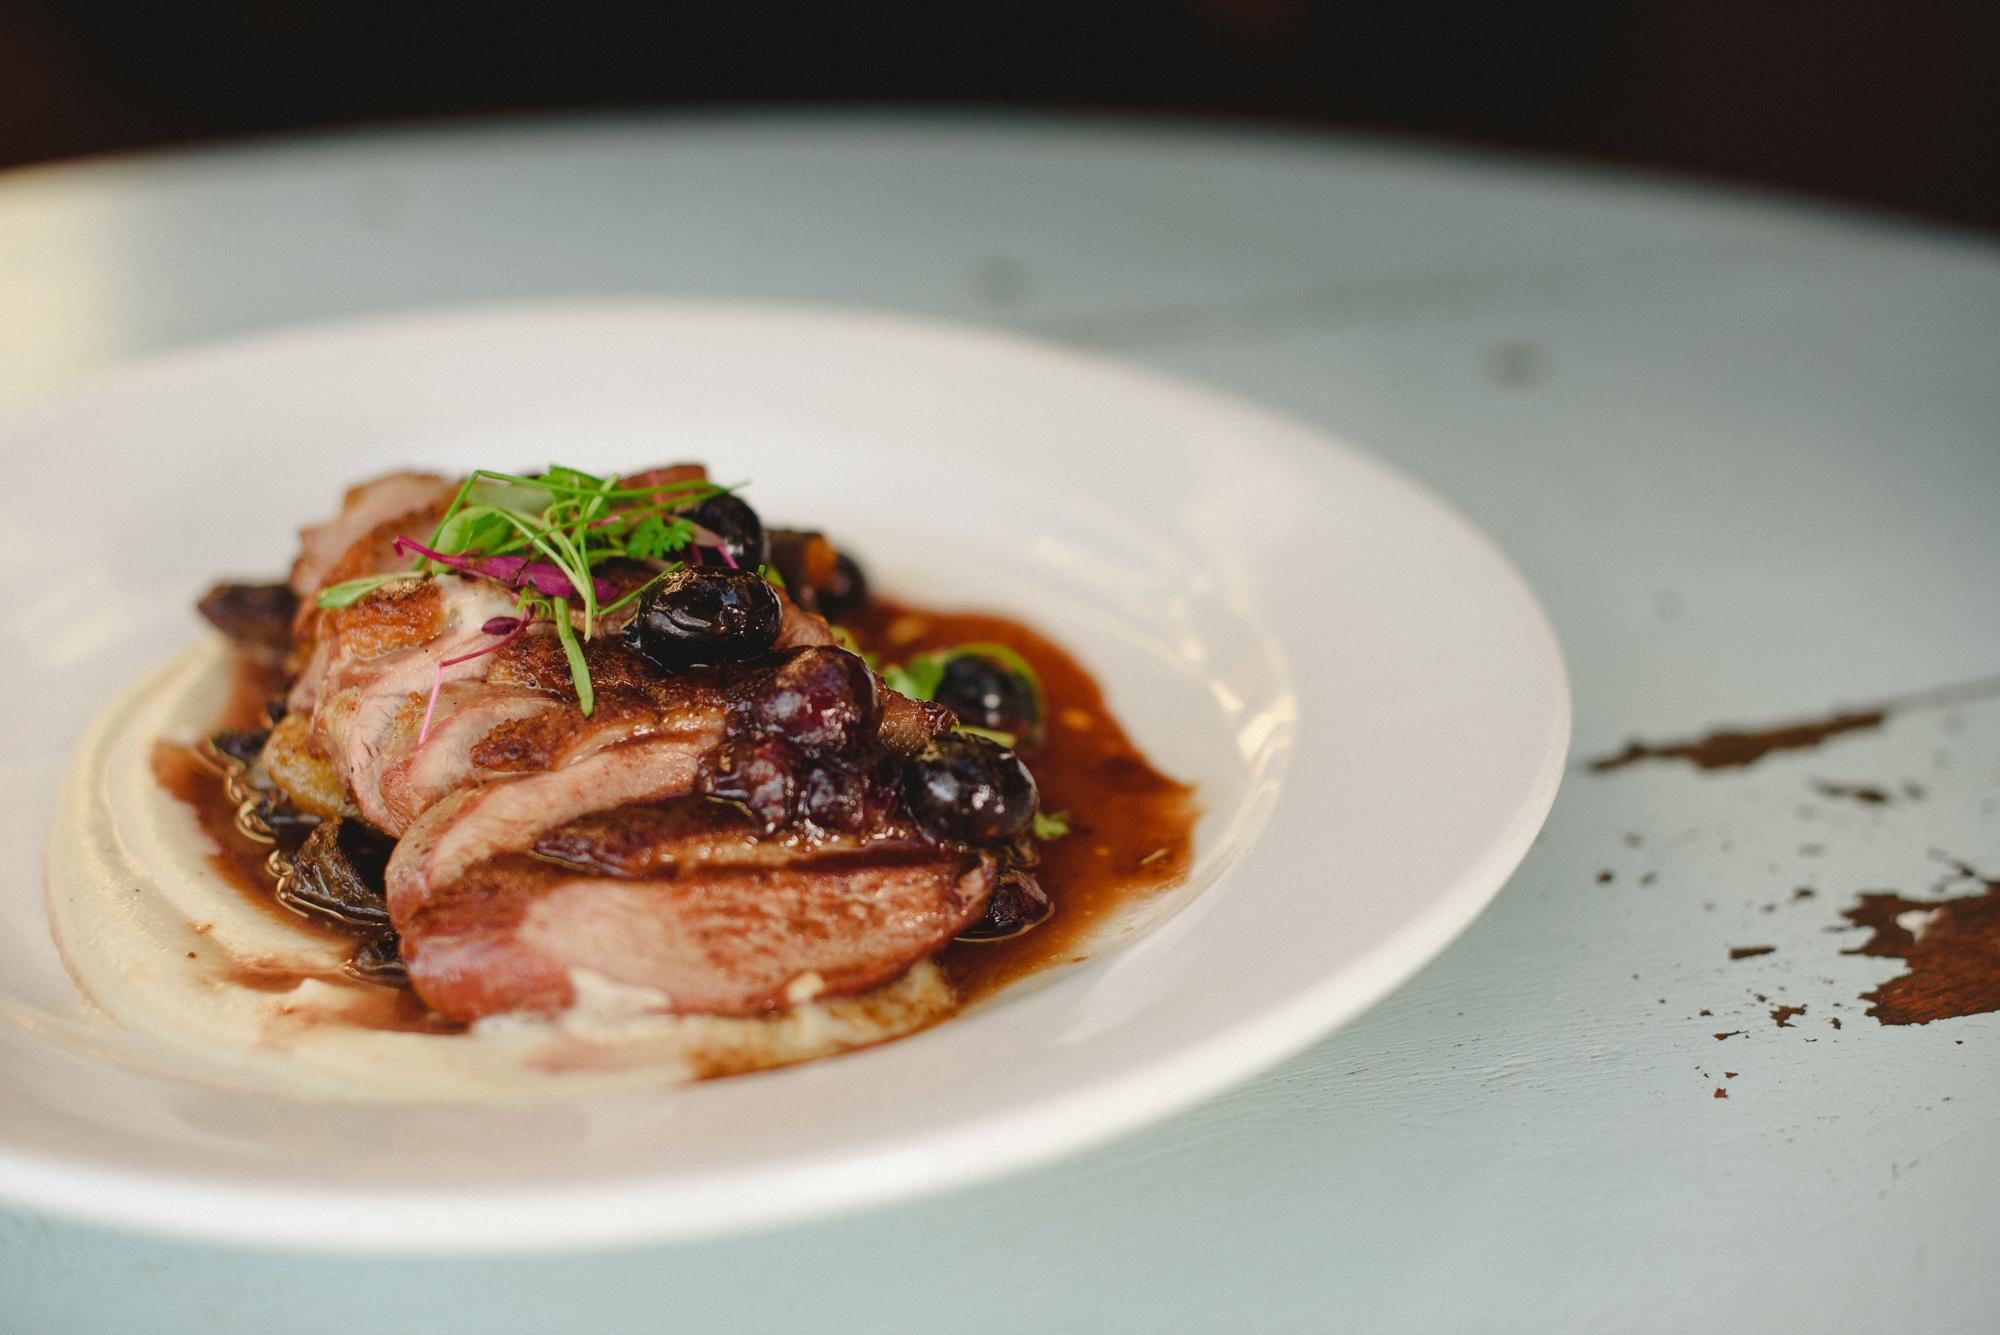 A-Tavola-Trattoria-New-Paltz-Hudson-Valley-NY-Best-Italian-Restaurant-162.jpg